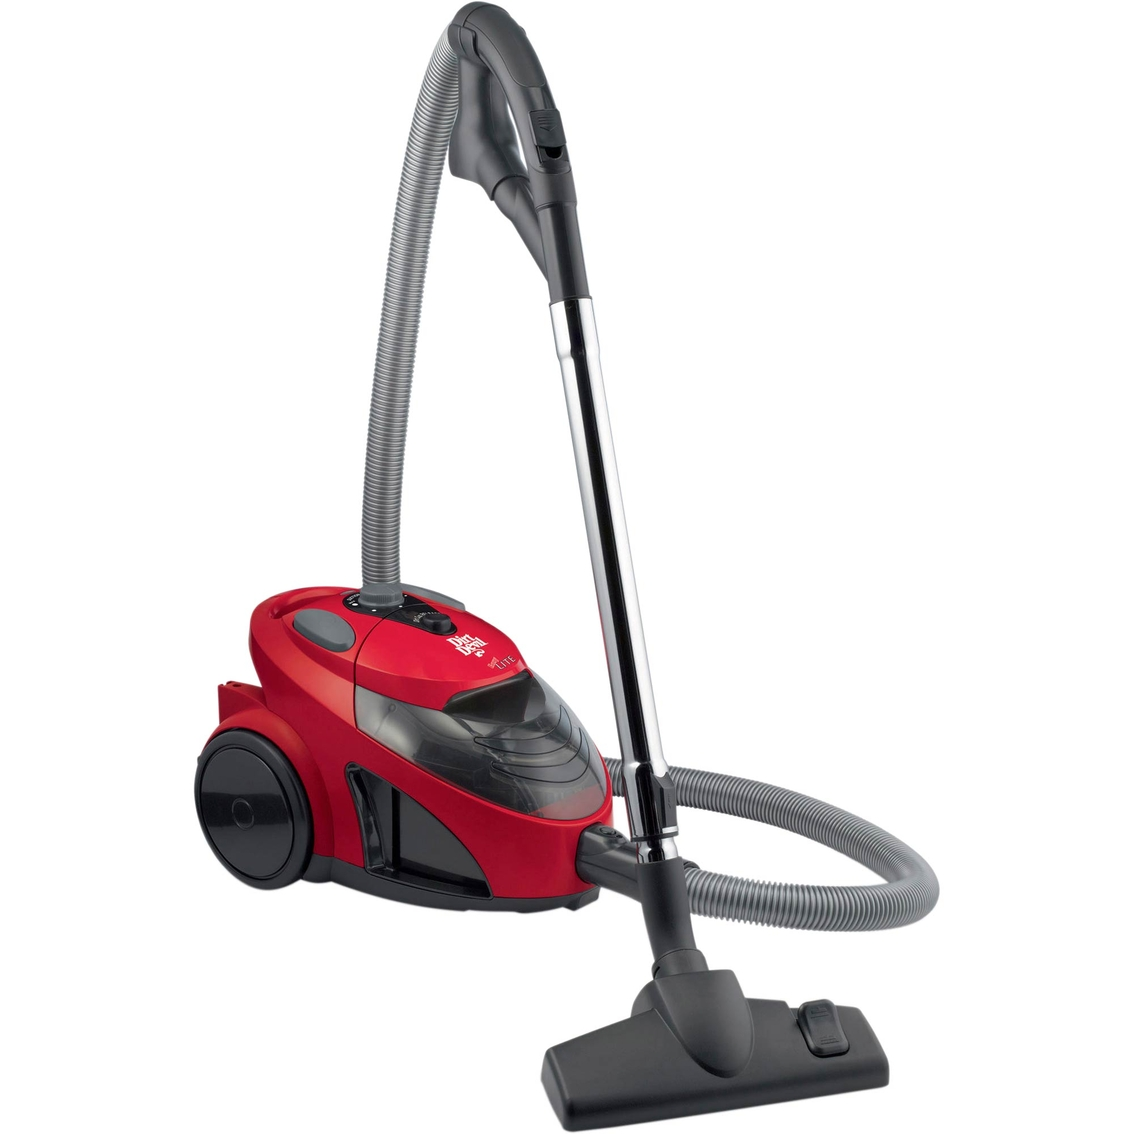 dirt devil ez lite bagless canister vacuum vacuums. Black Bedroom Furniture Sets. Home Design Ideas